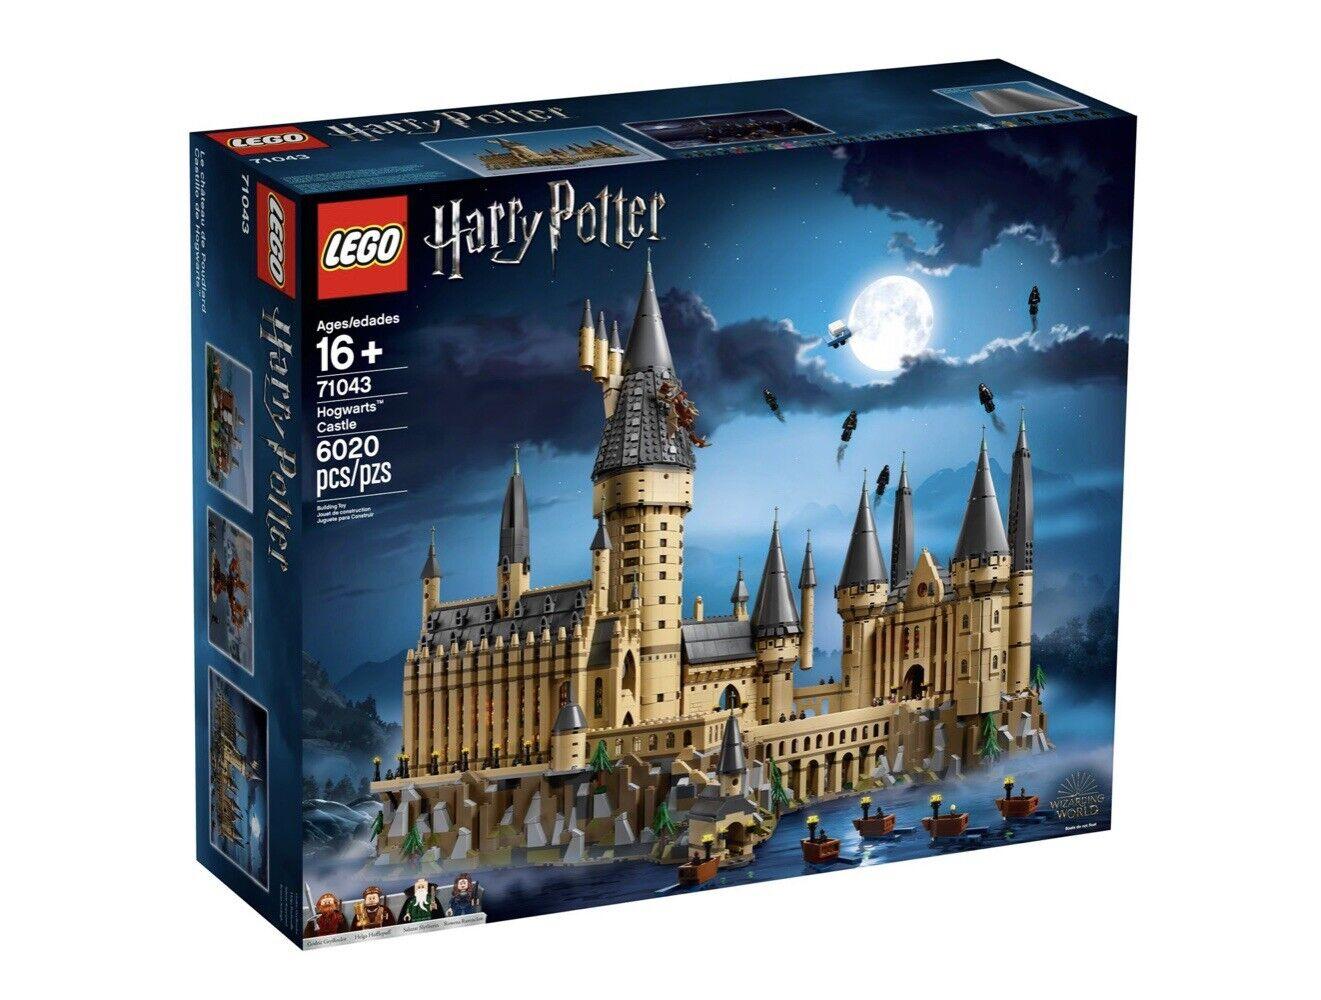 LEGO 71043 - HARRY POTTER HOGWARTS CASTLE- NEW